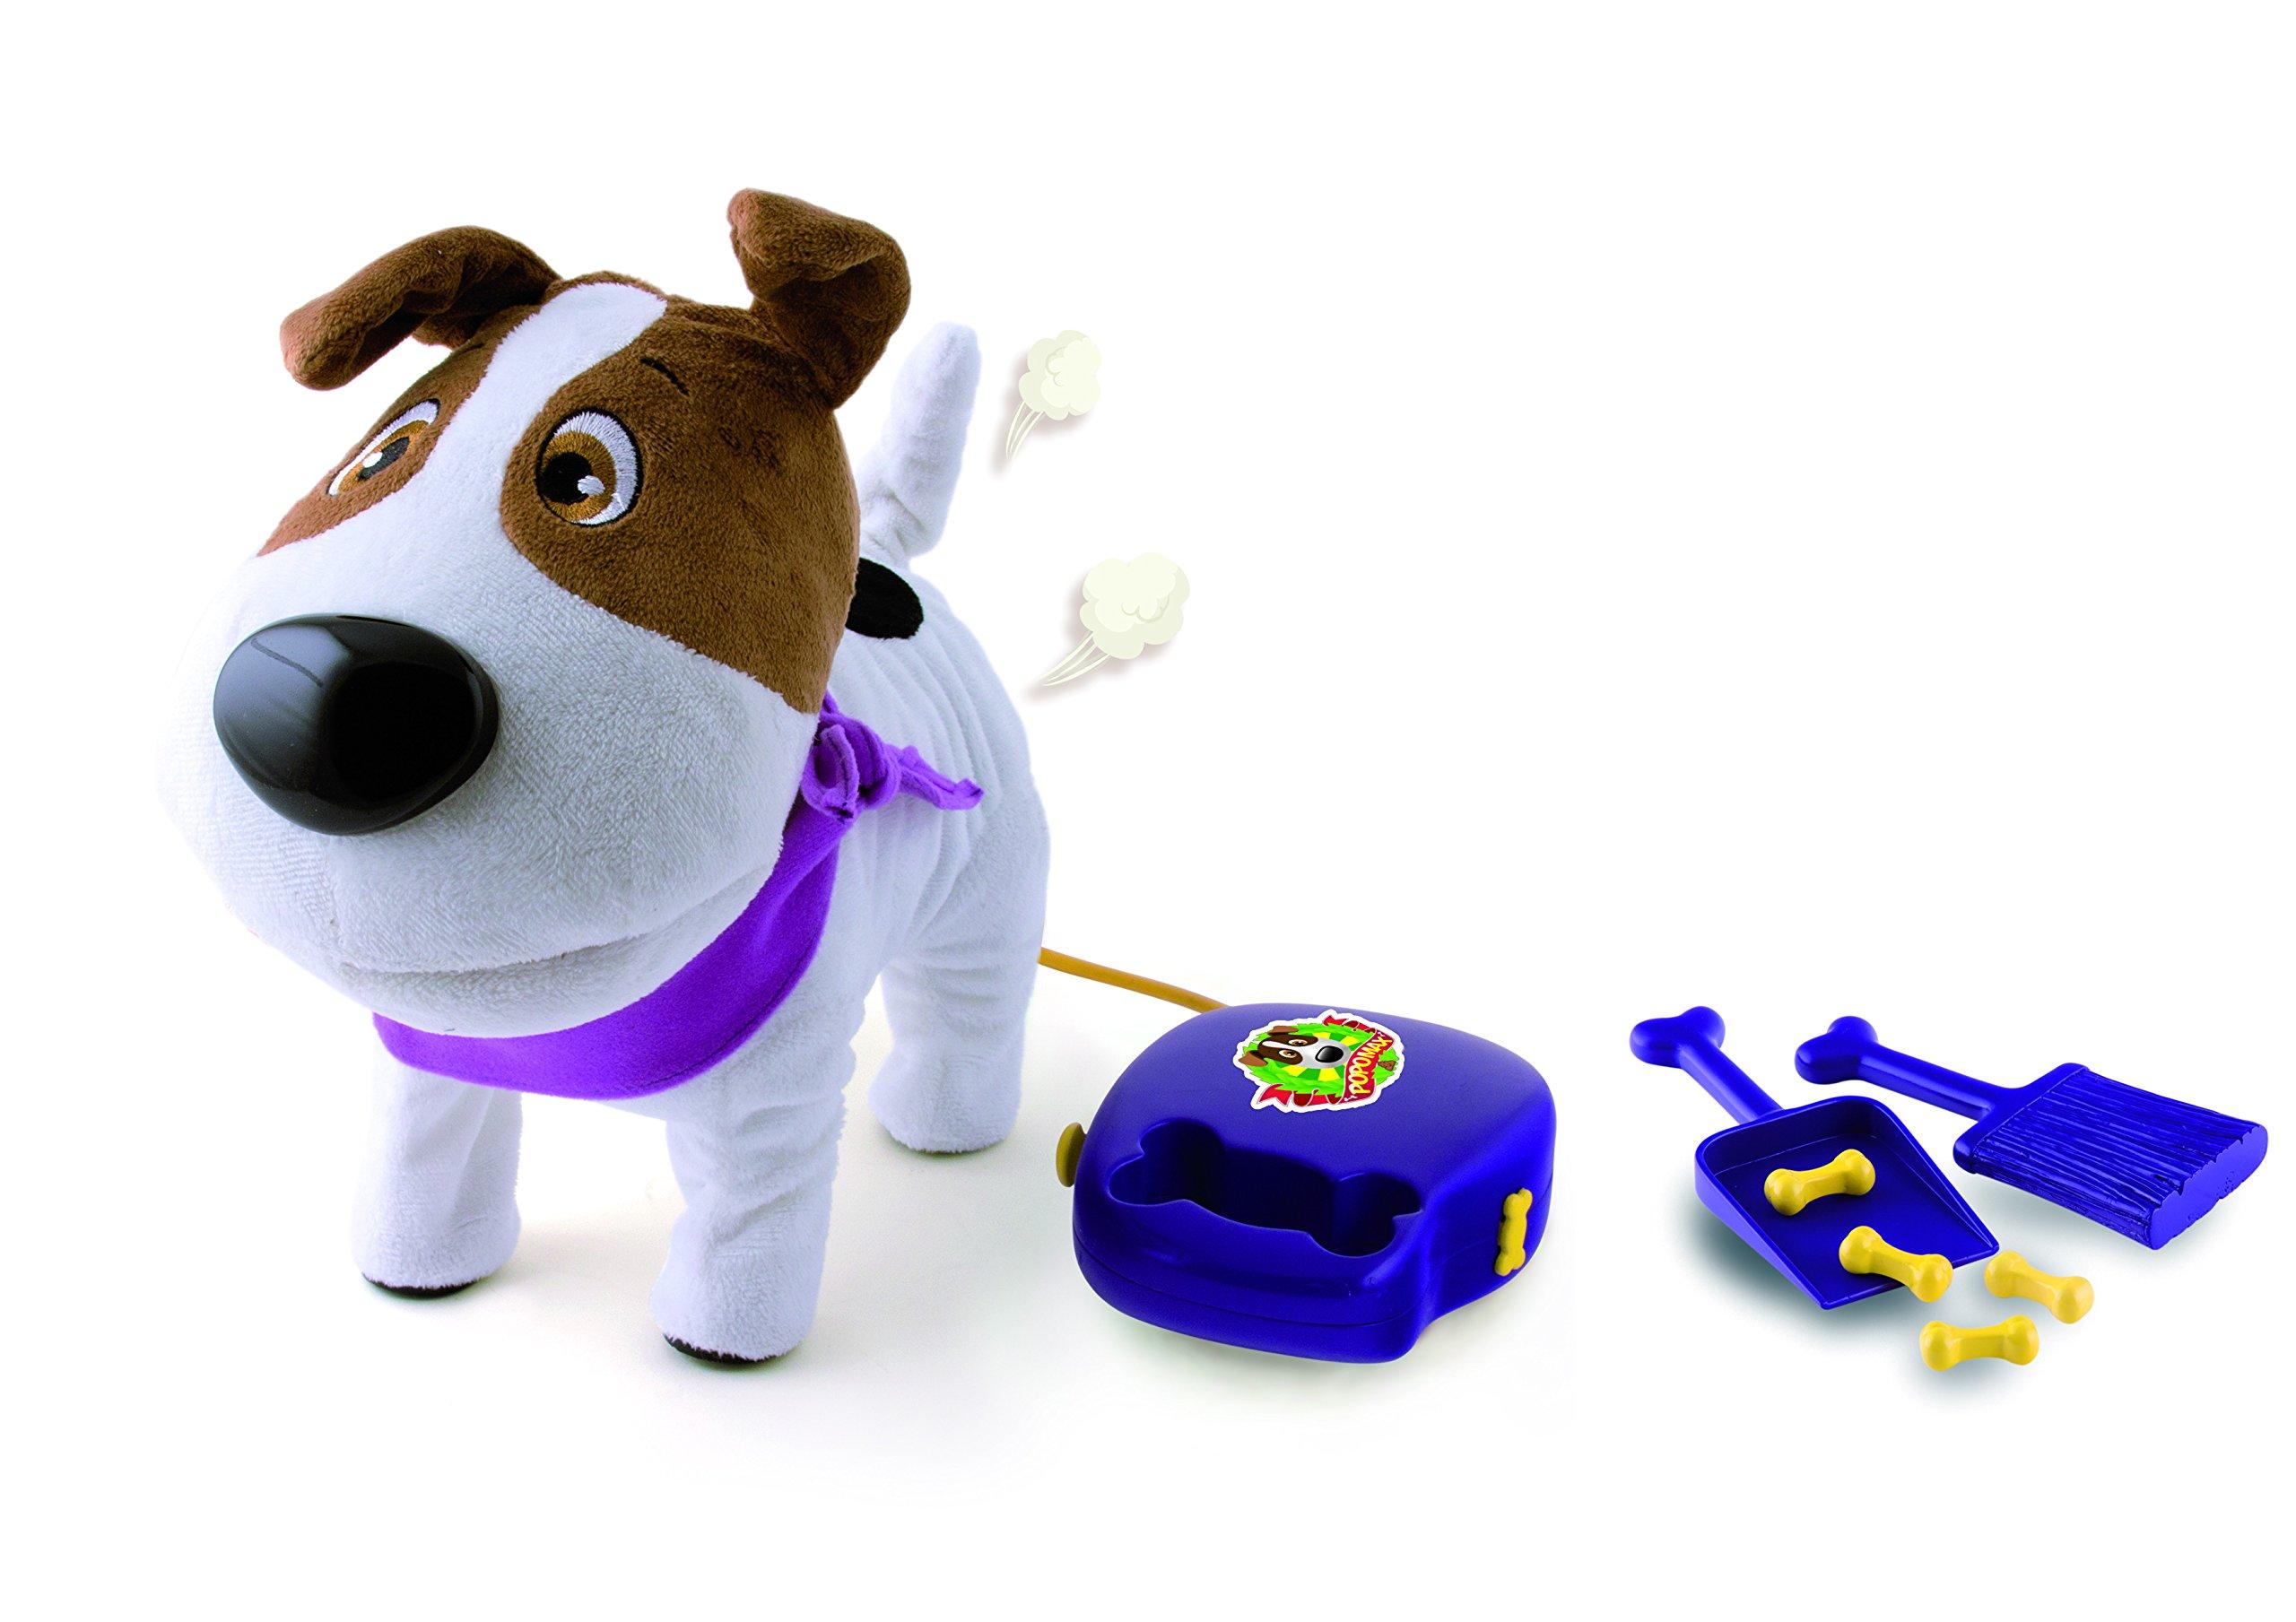 IMC Toys - 093997 - Caca Max product image